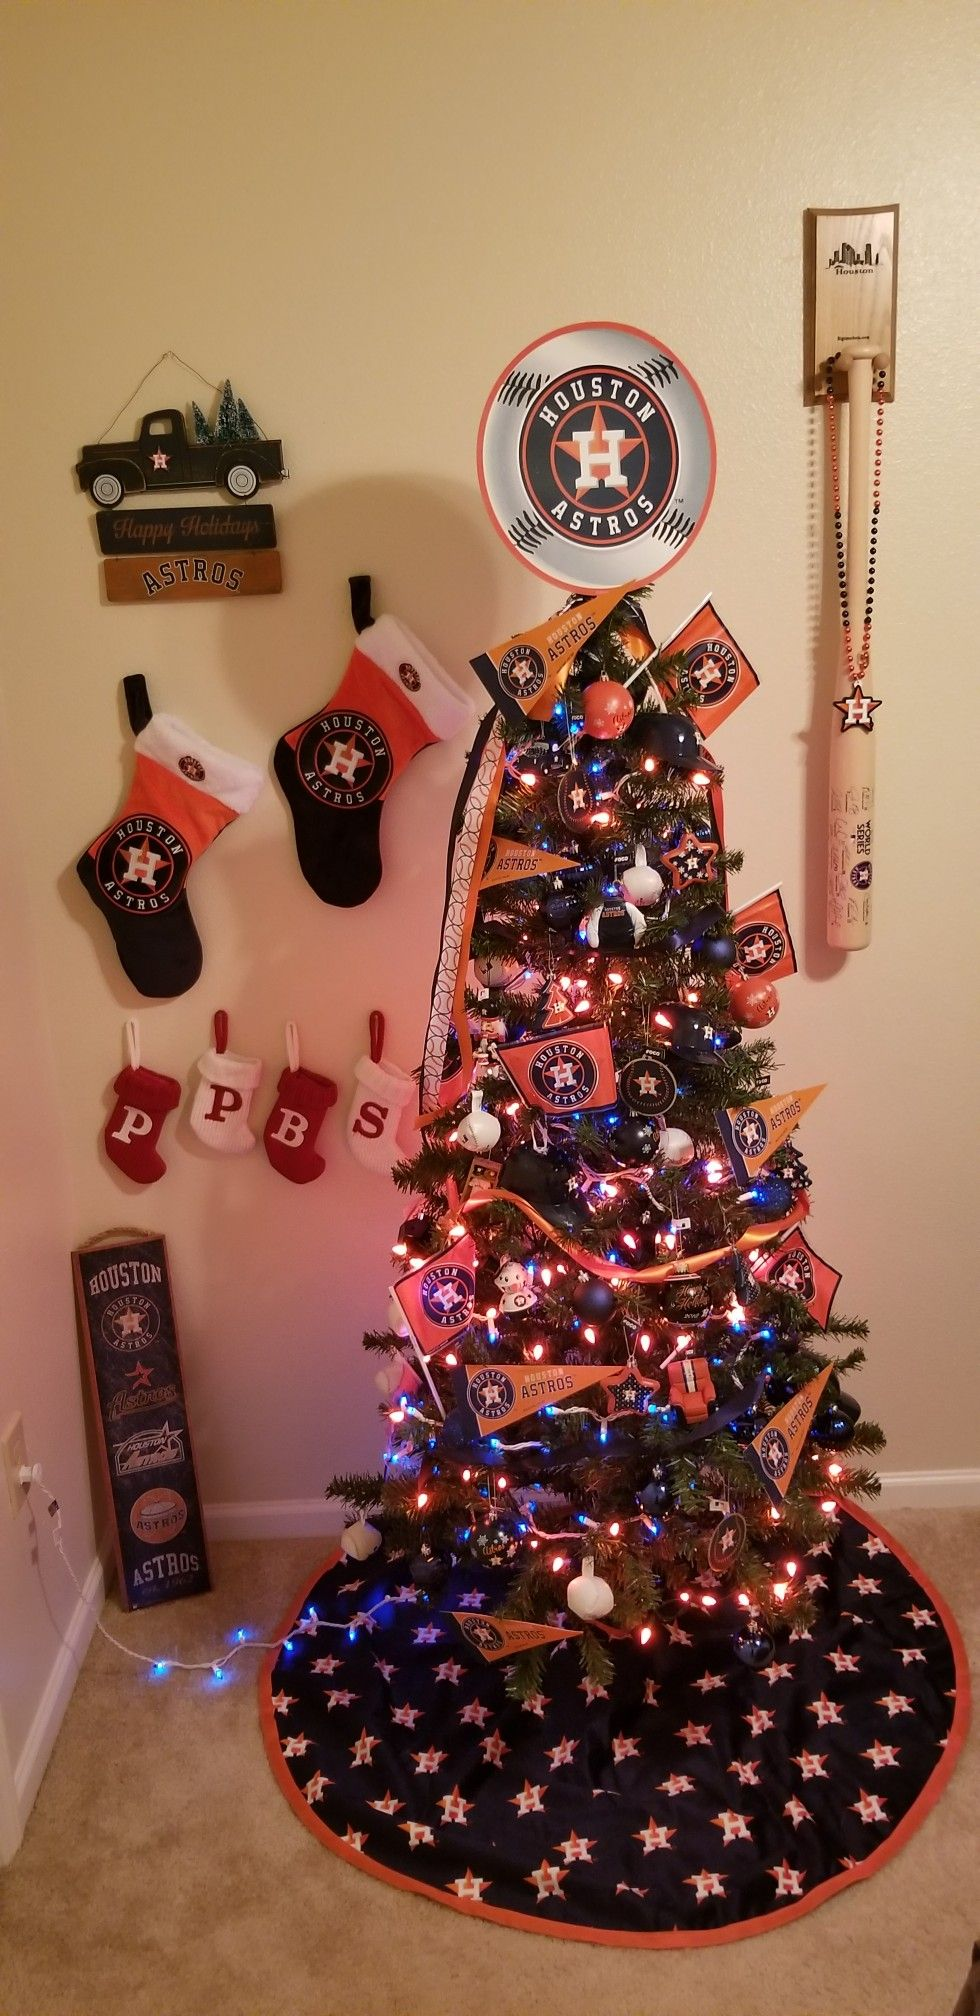 Houston Astros Christmas Tree | Christmas tree, Holiday ...